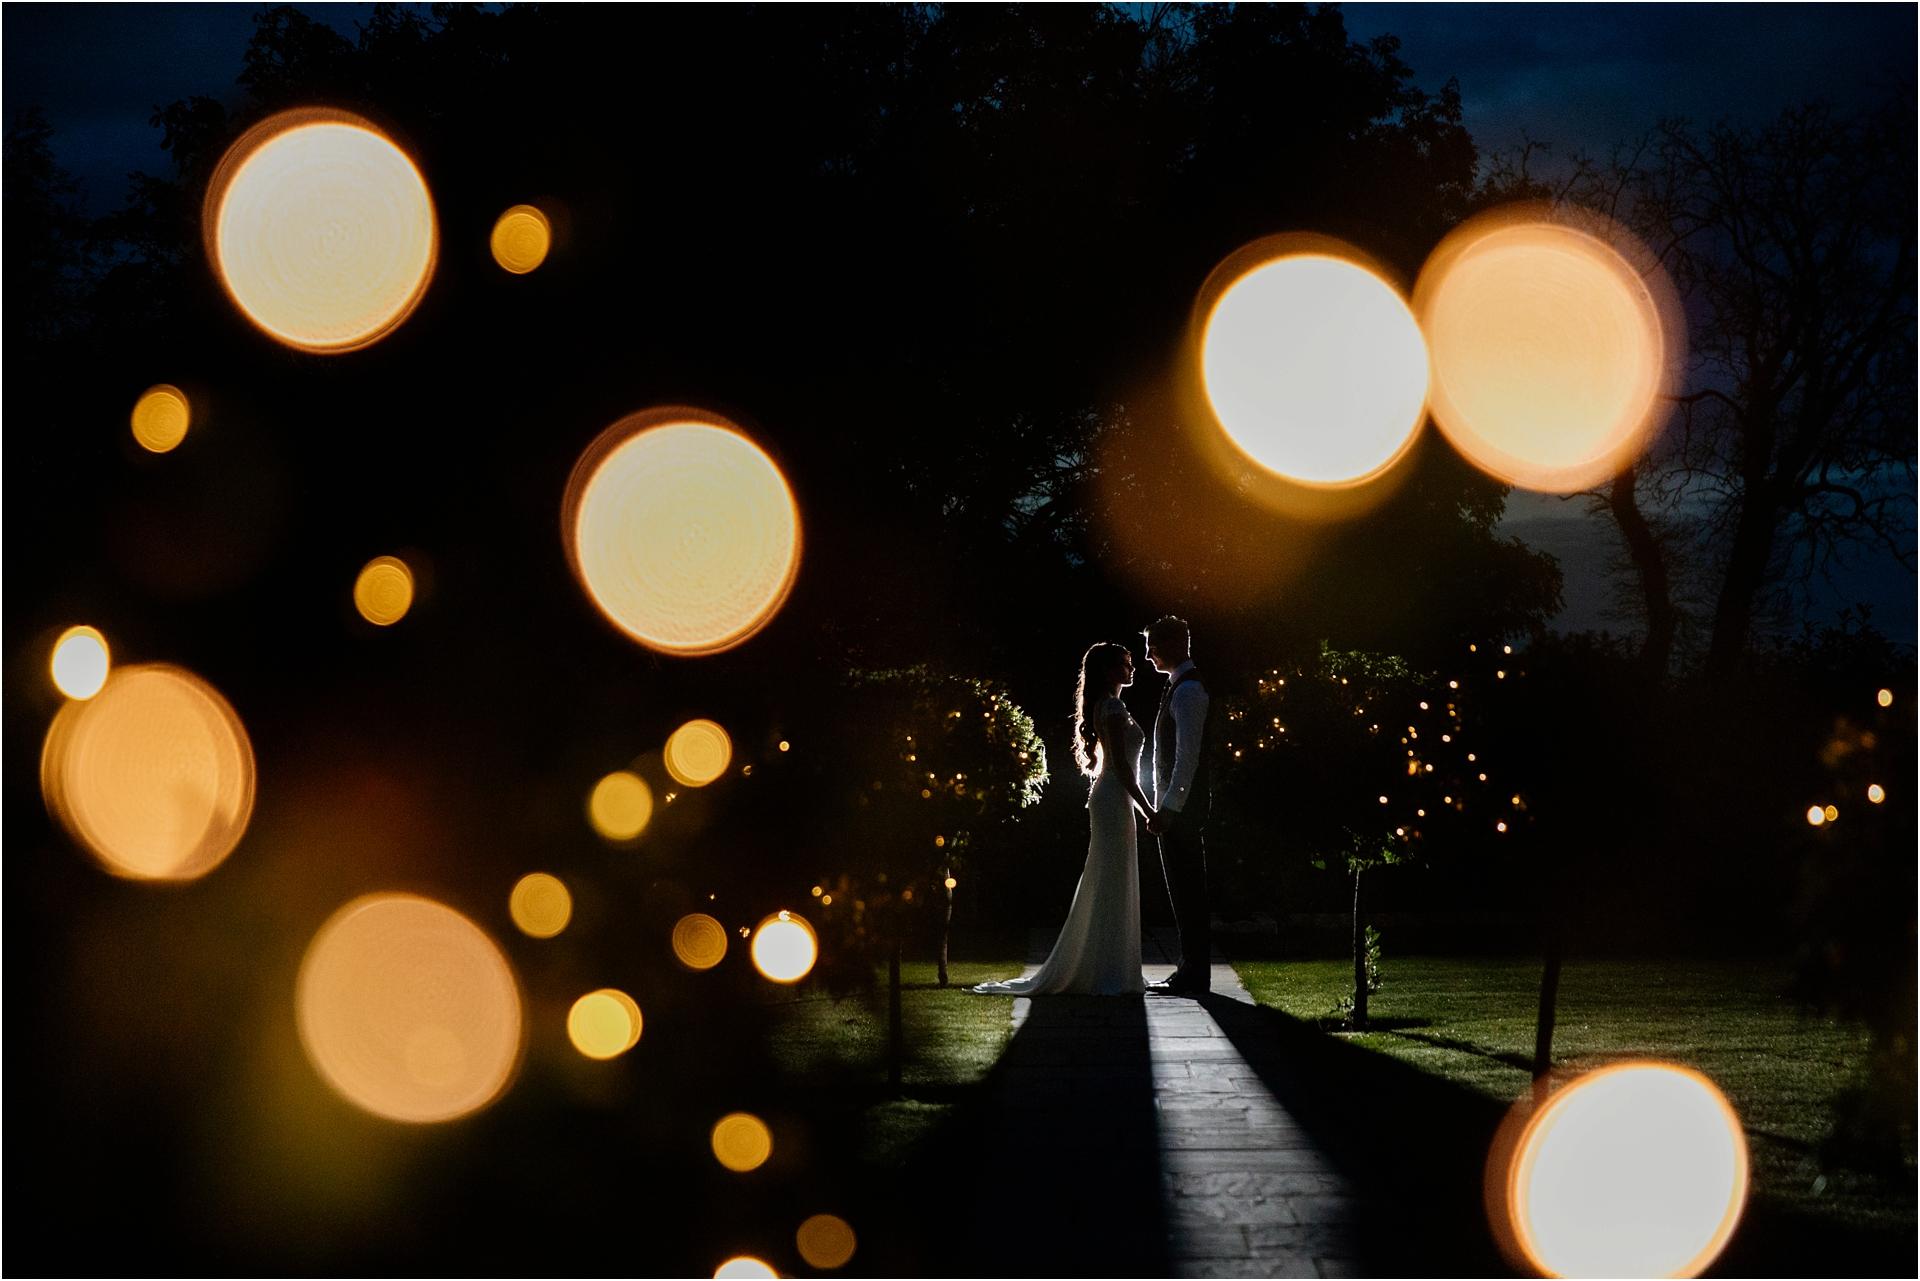 Night time wedding photo at Blackwell Grange